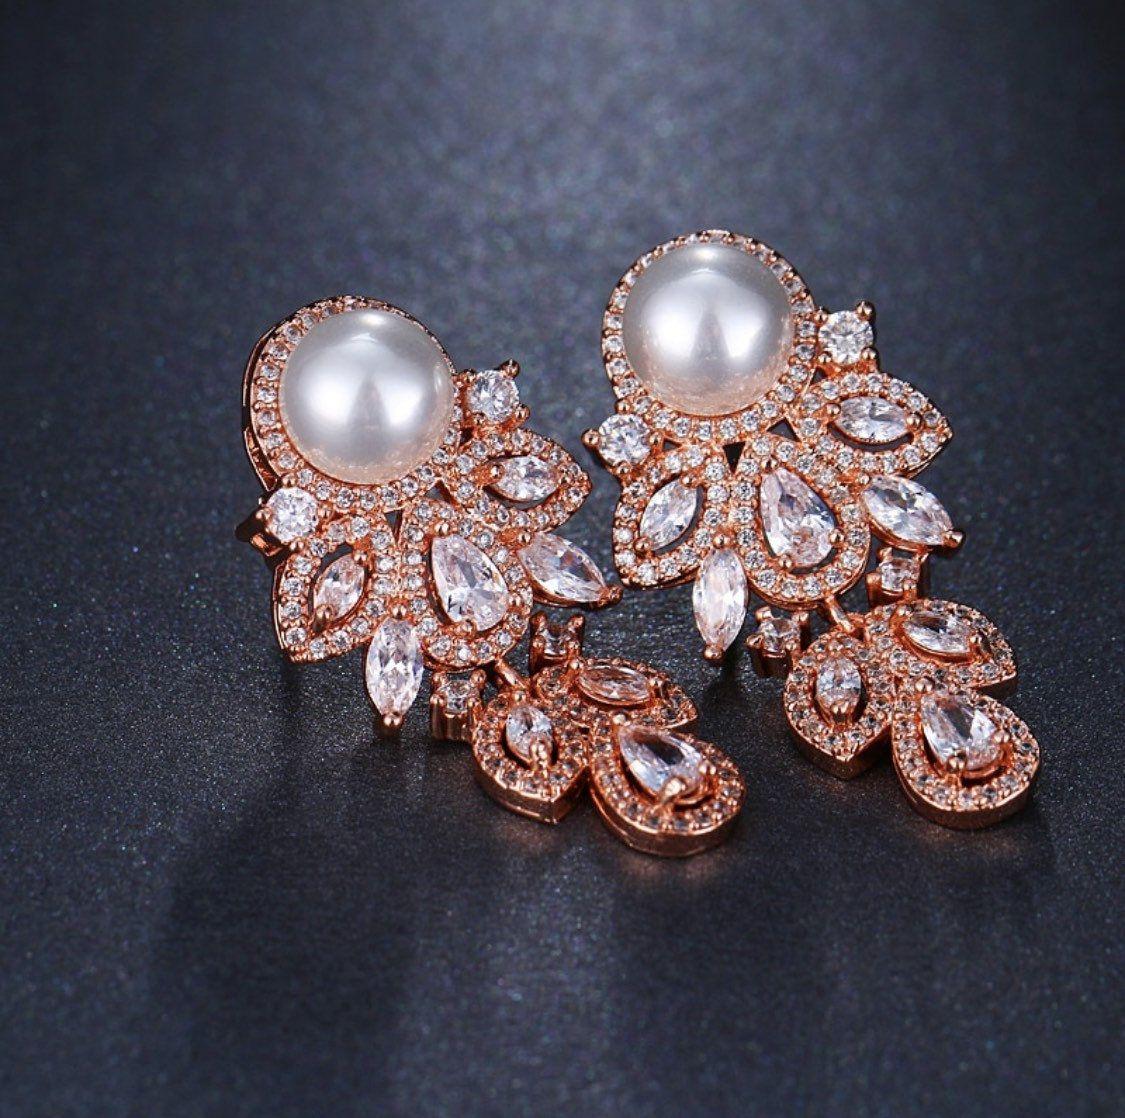 Pair Pearl Leaf Dangle Drops GOLD Wedding Gauges tunnels Plugs earring 8g 6g 4g 2g 0g 00g 716 12 3mm 4mm 5mm 6mm 8mm 10mm 11mm 12mm